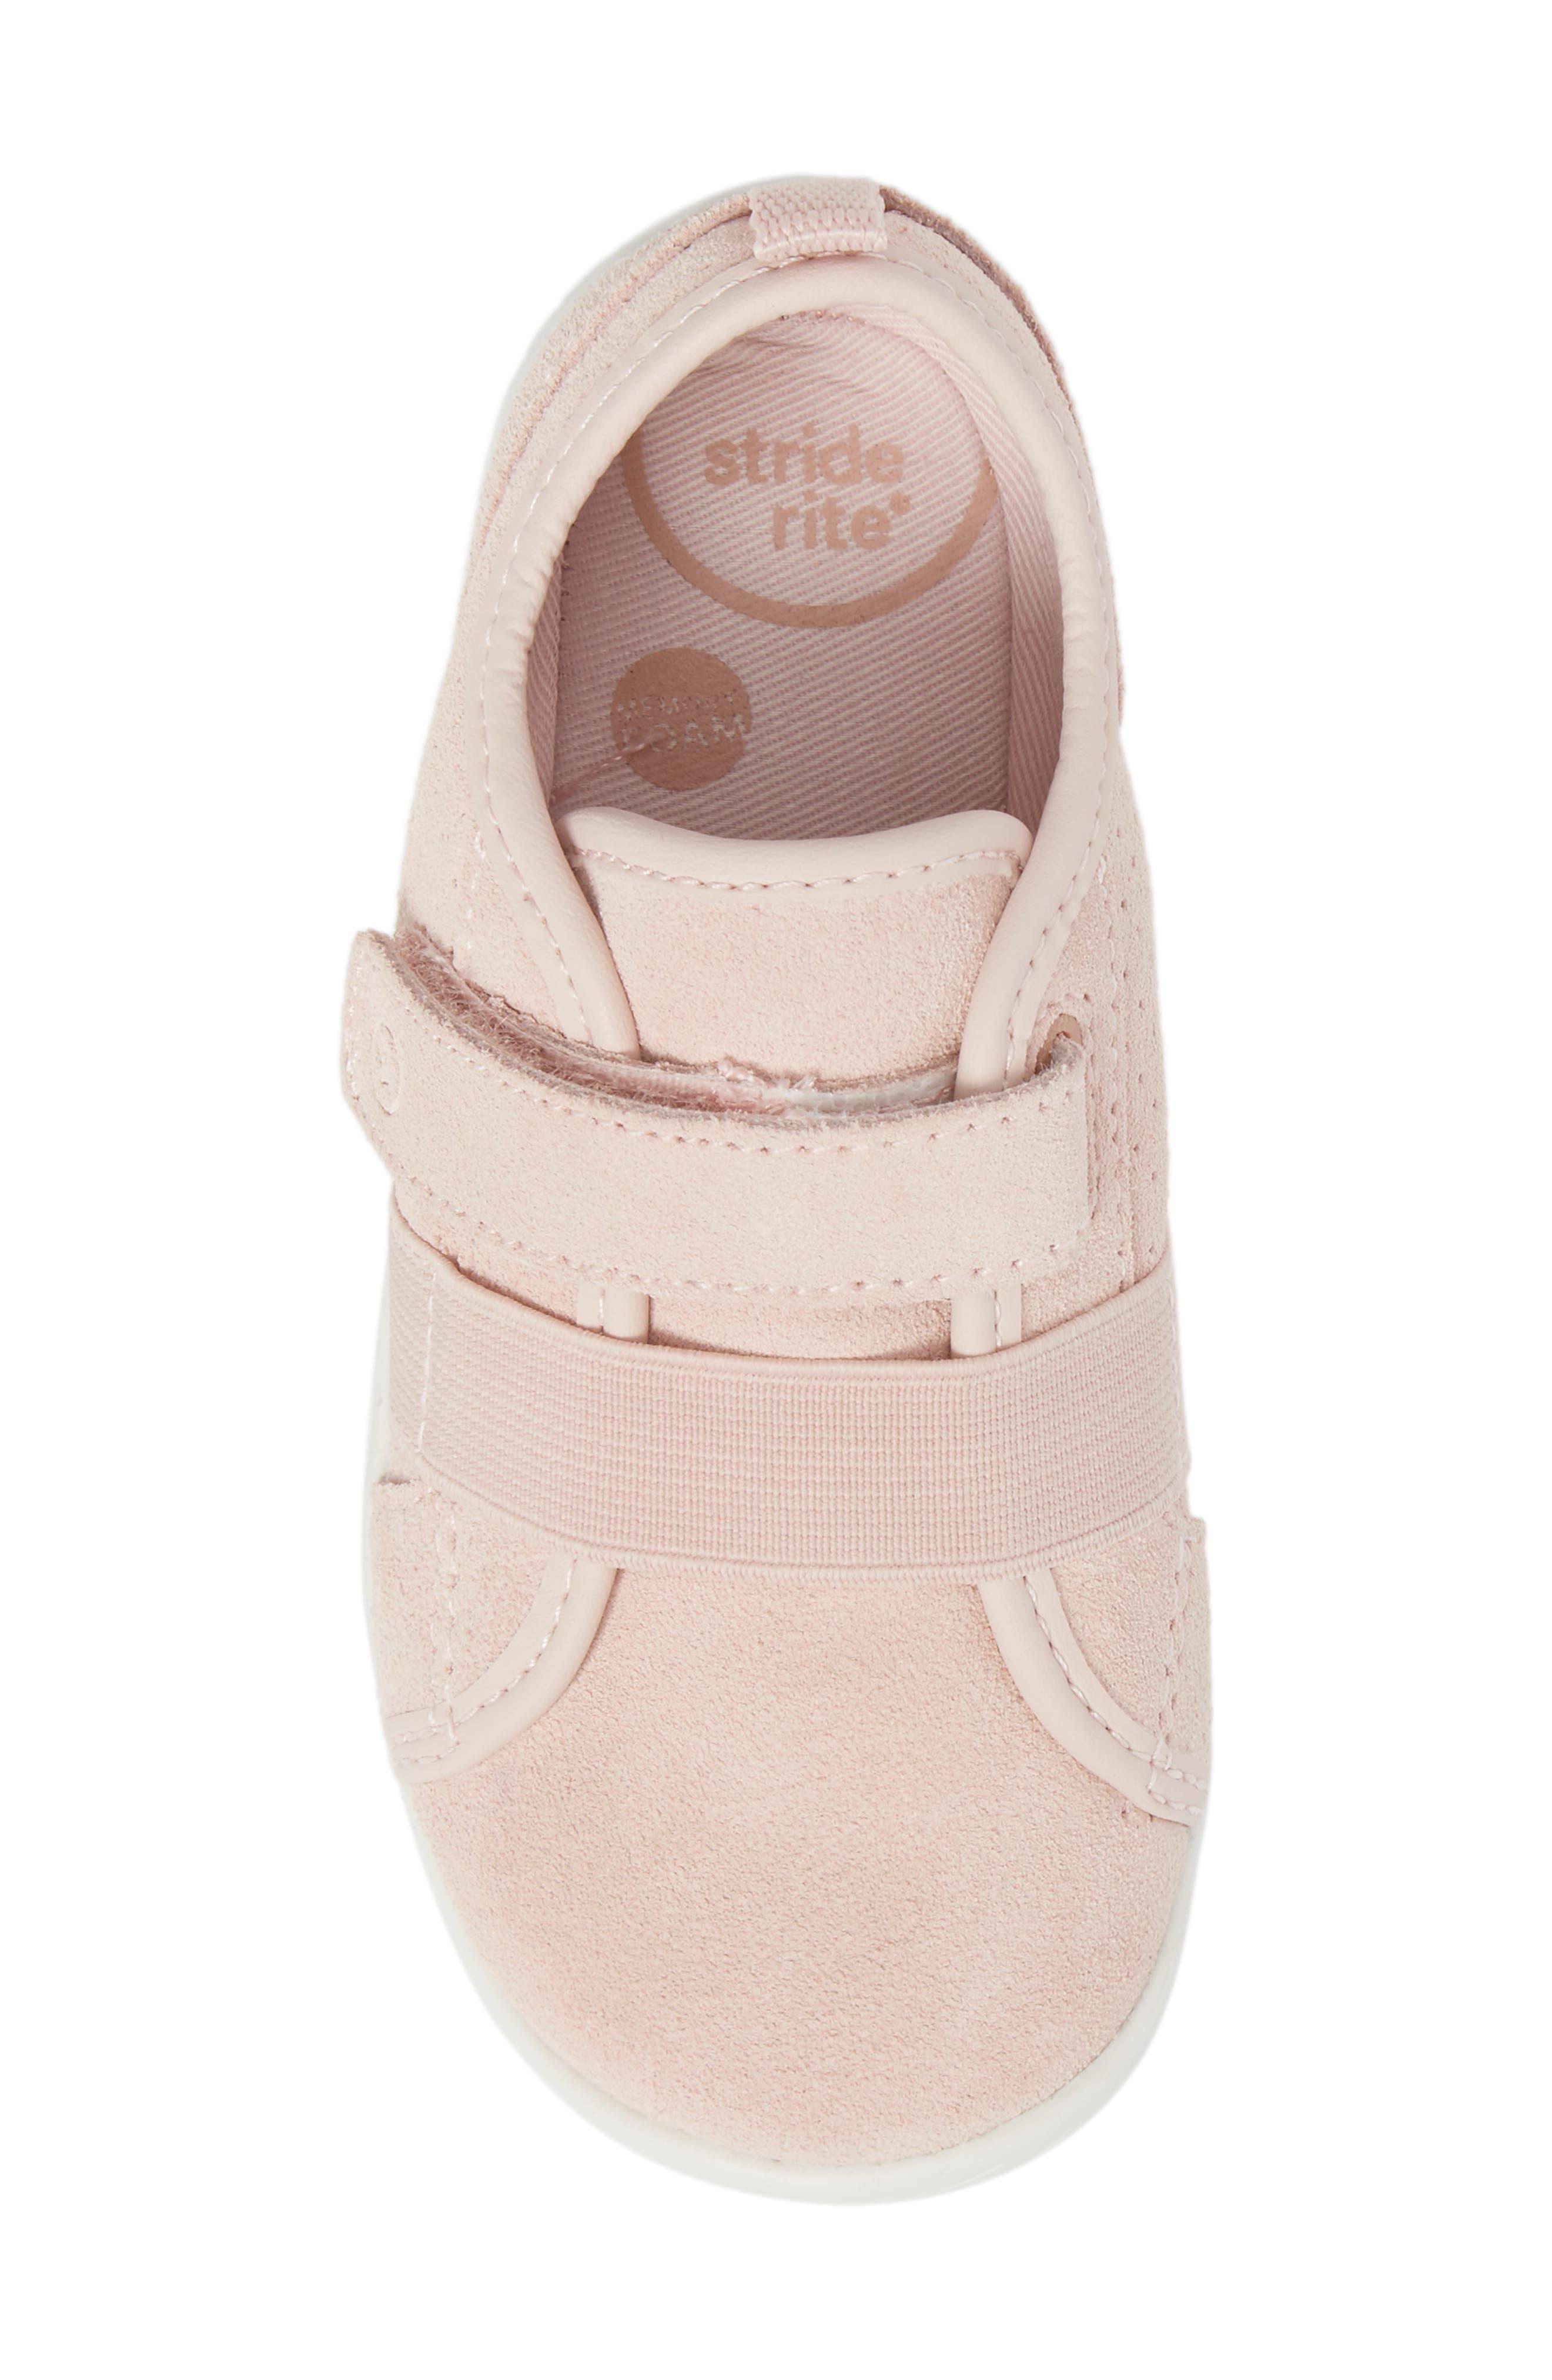 SRtech<sup>™</sup> Riley Sneaker,                             Alternate thumbnail 5, color,                             Blush Leather